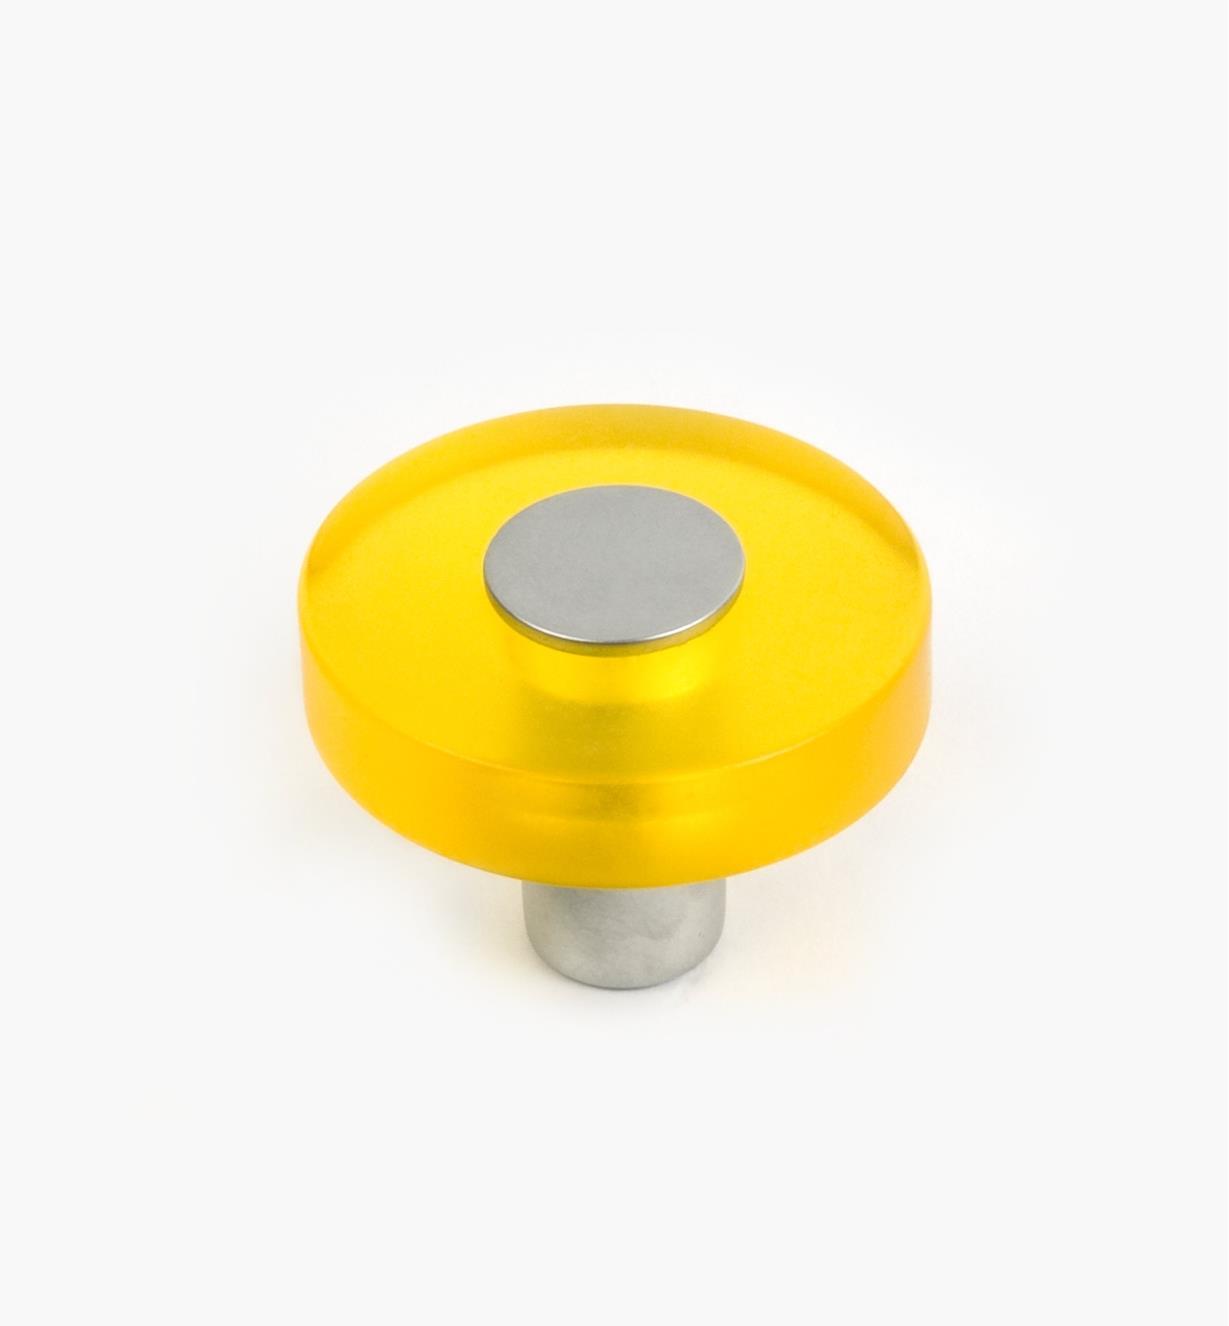 01W1181 - Malaga Hardware, Yellow Round Knob